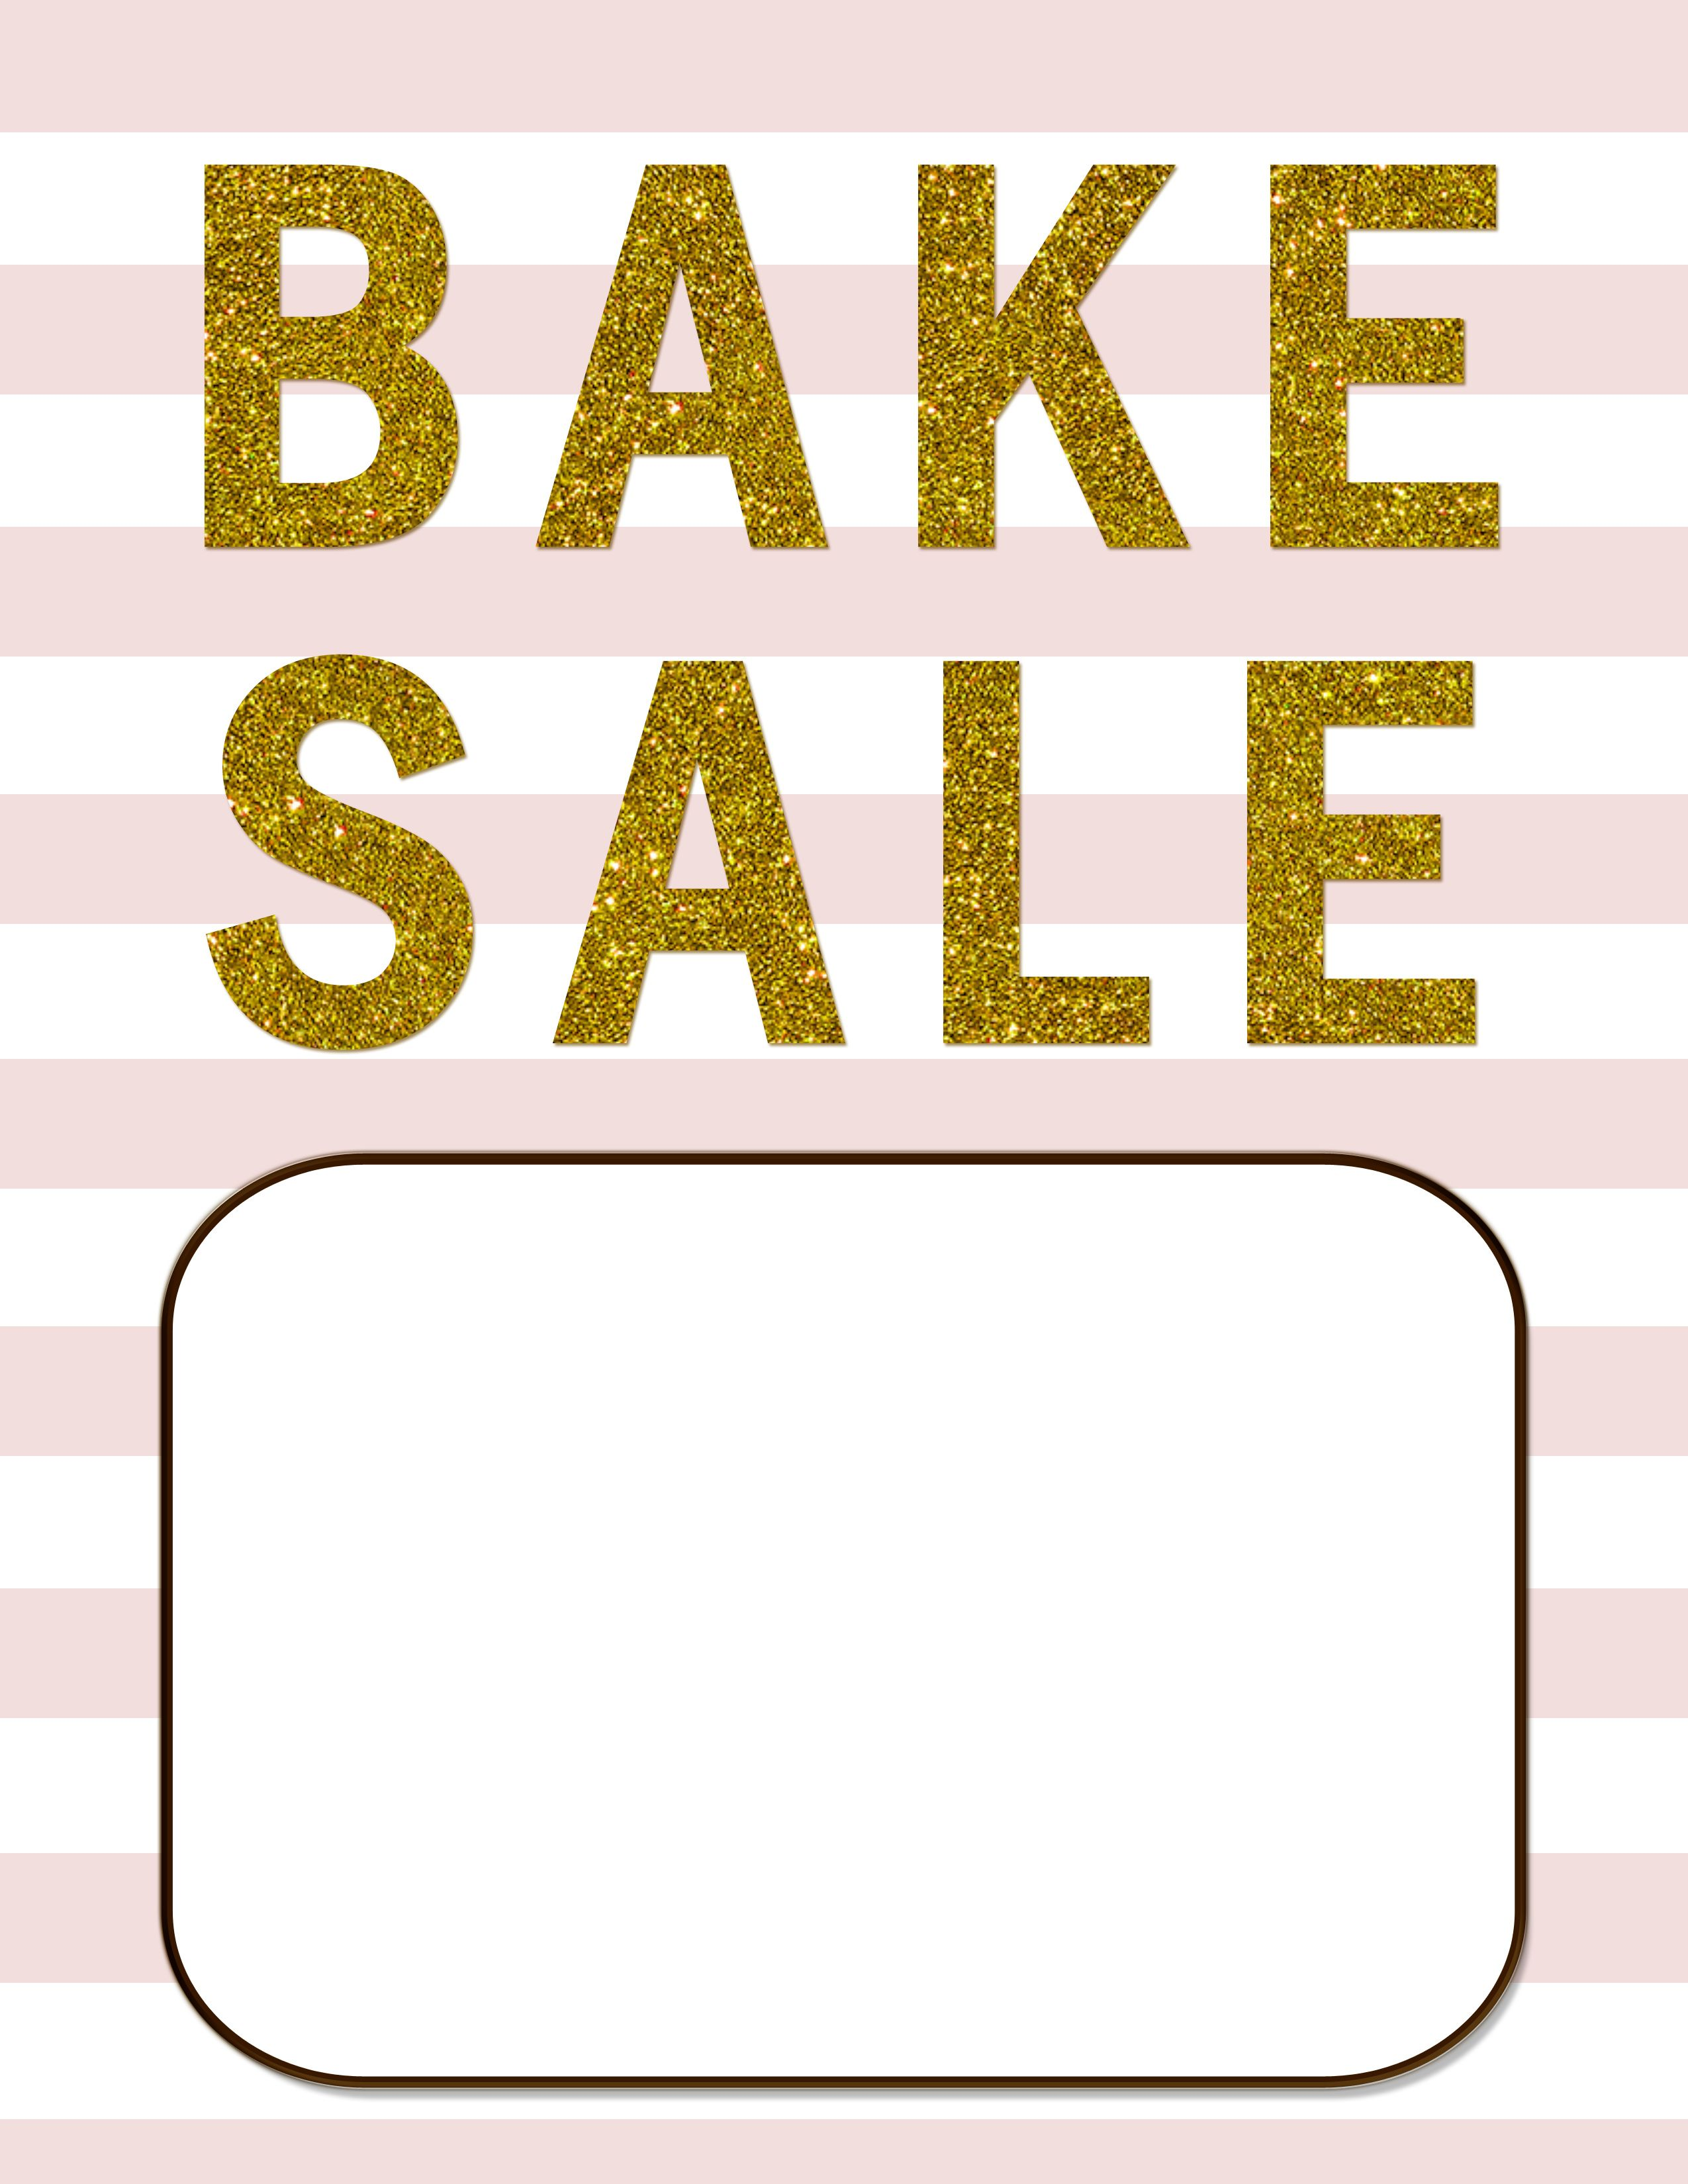 bake sale flyers free flyer designs - 736×952